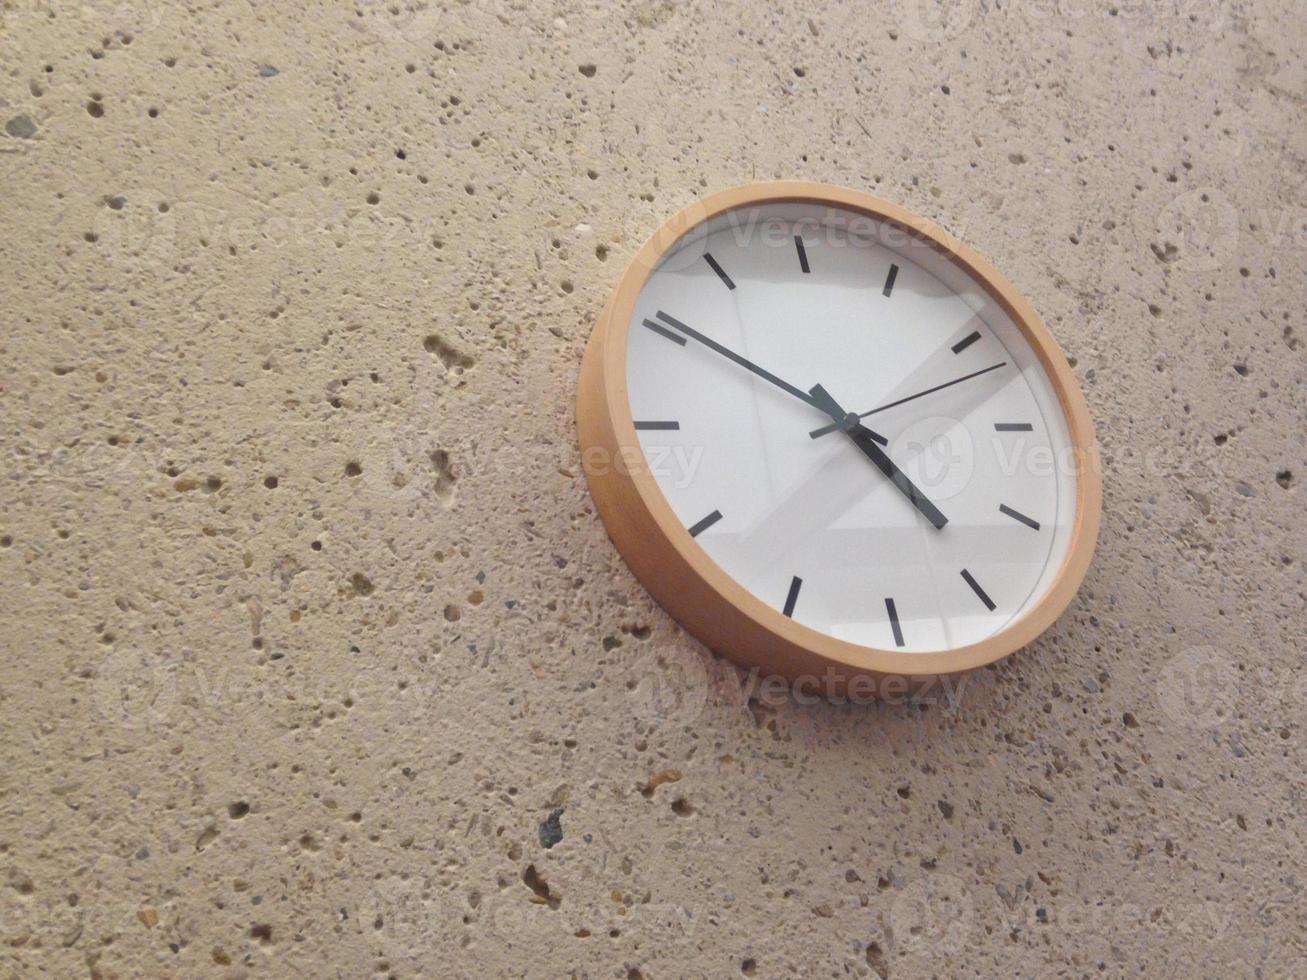 horloge murale analogique classique simple photo